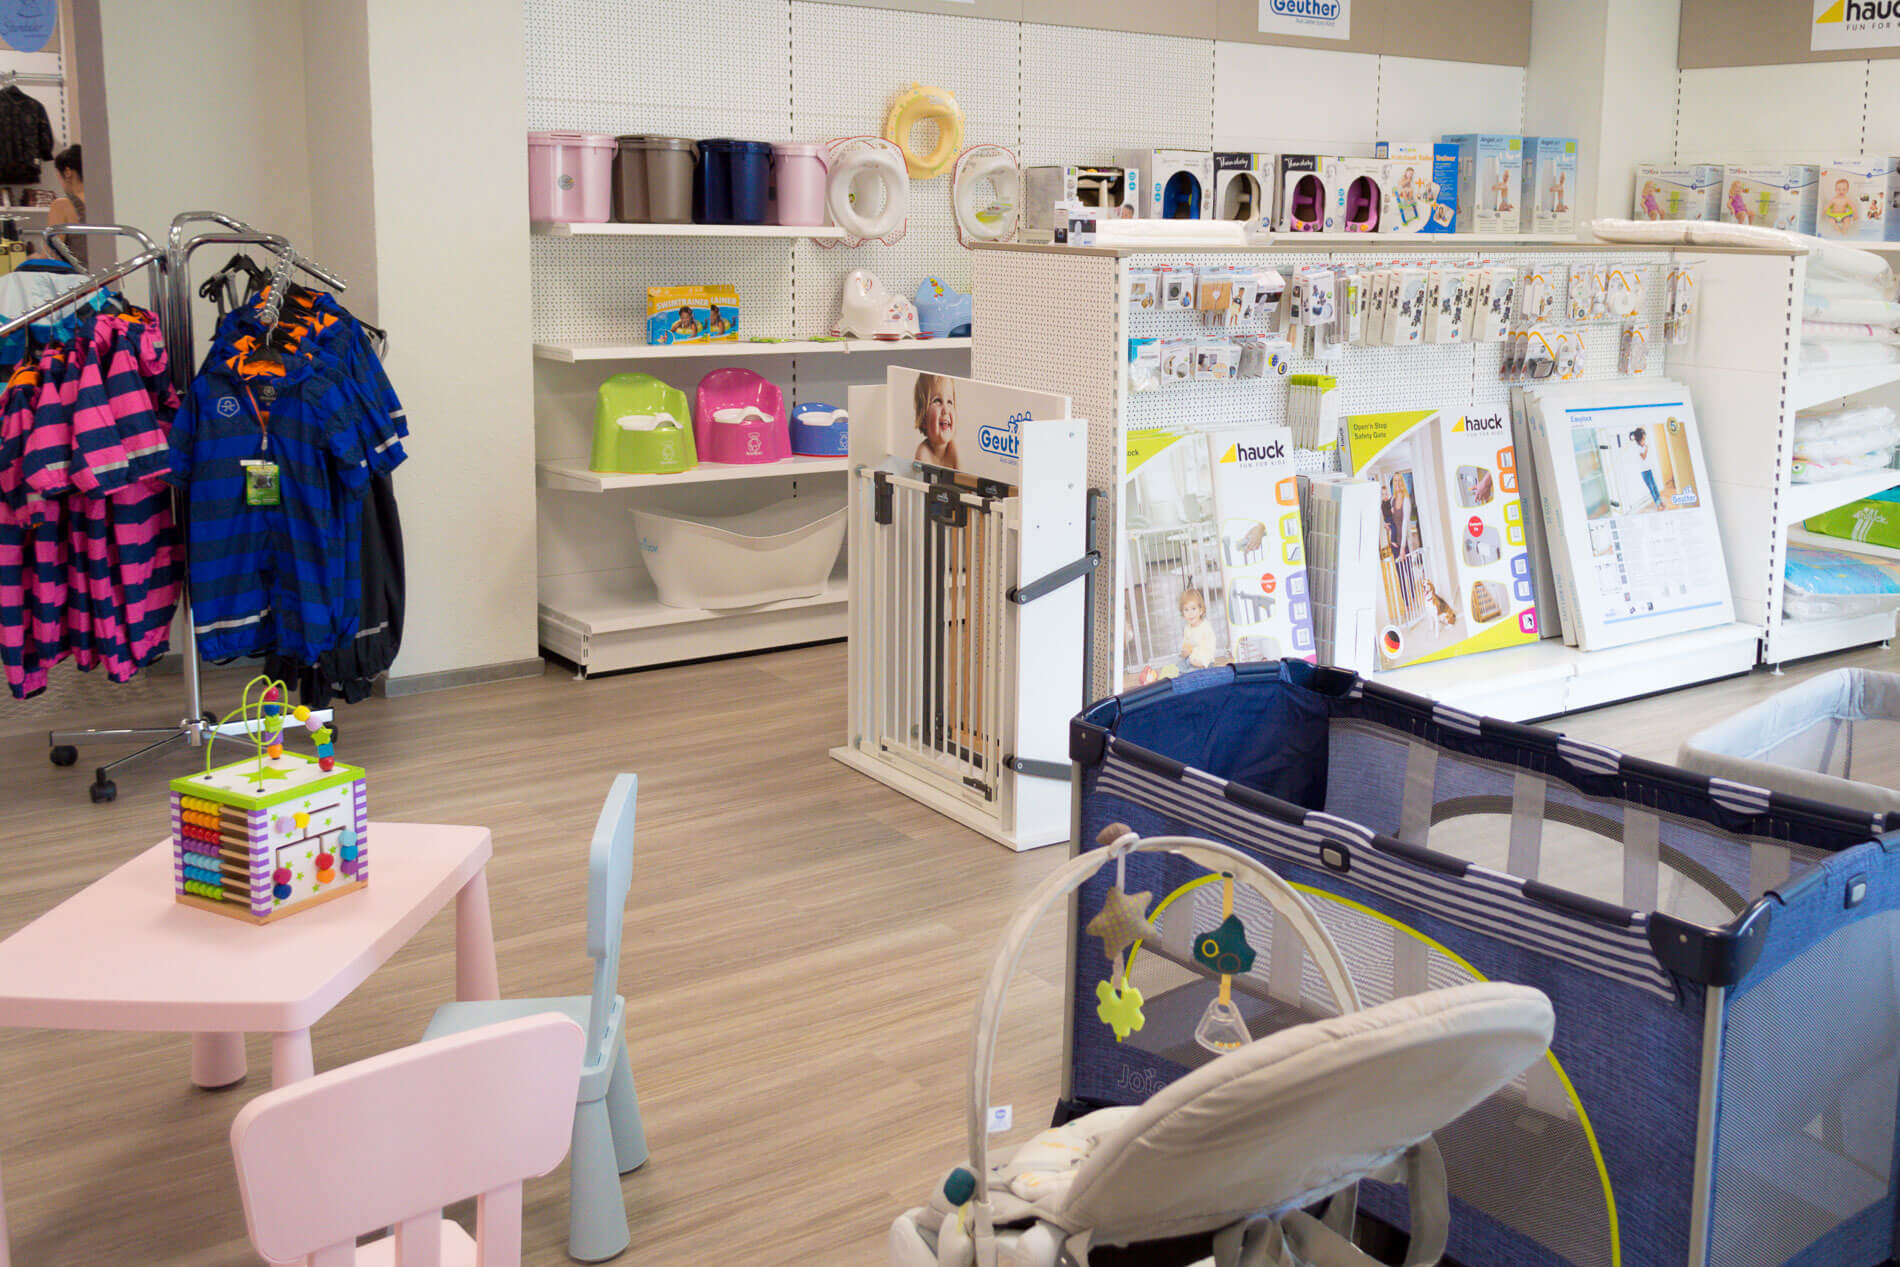 LeBalu - Babyfachgeschäft in Meiningen | Haushaltsartikel